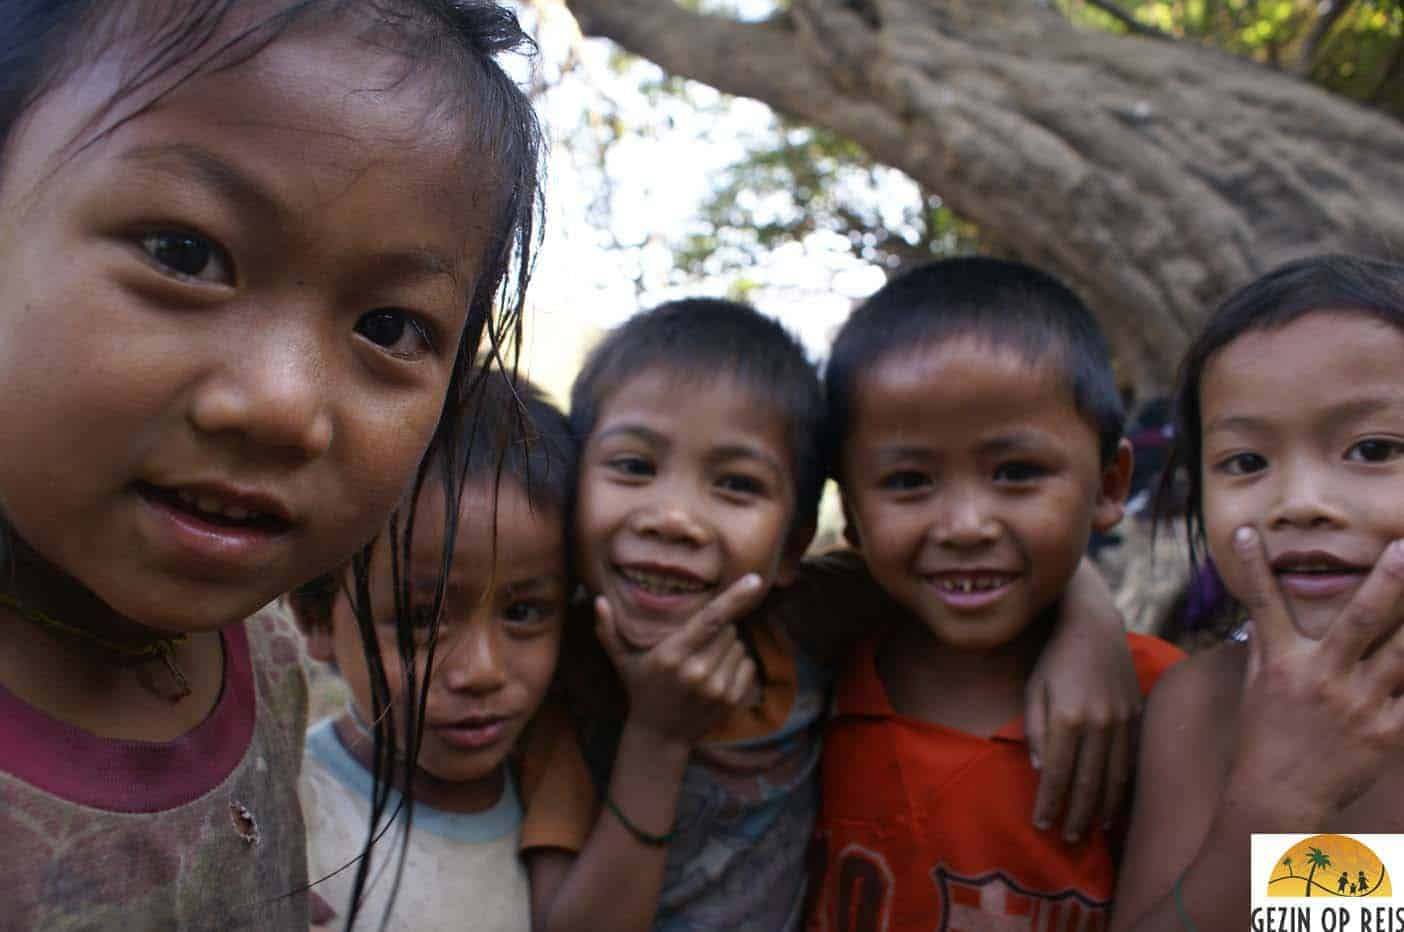 Dorpje Laos